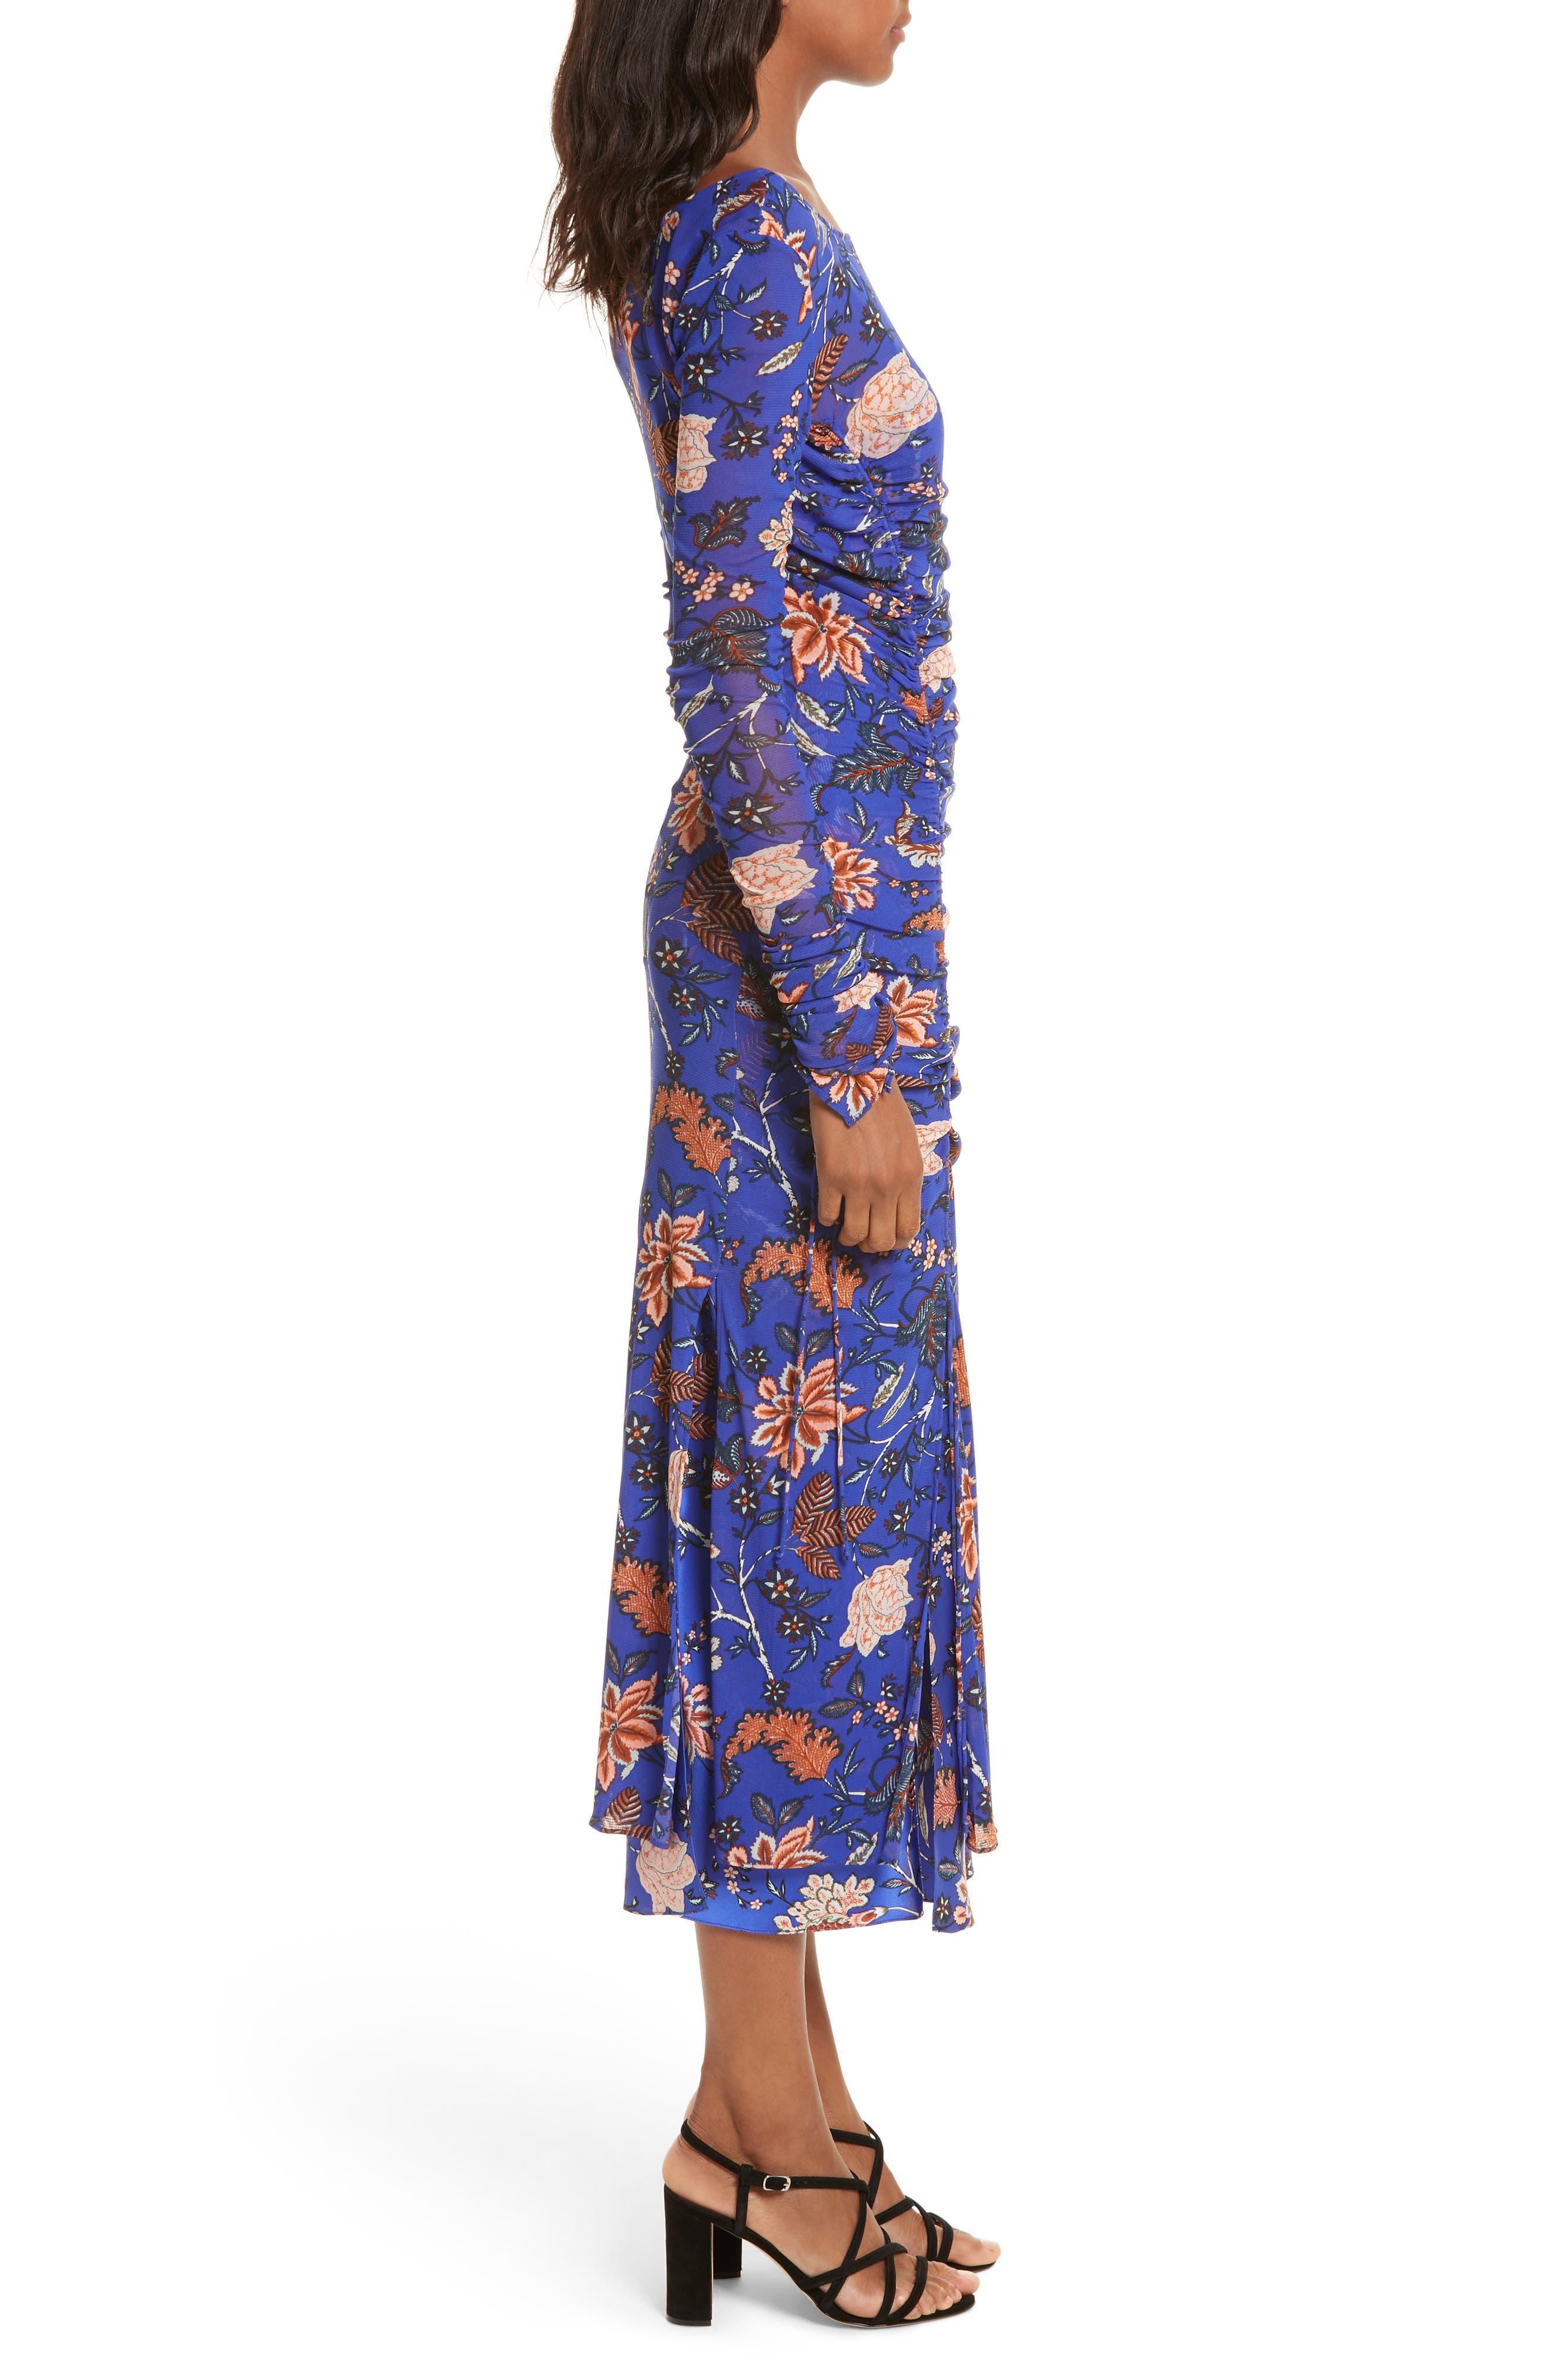 Diane von Furstenberg Mesh Overlay Floral Midi Dress,                             Alternate thumbnail 3, color,                             Canton Electric Blue